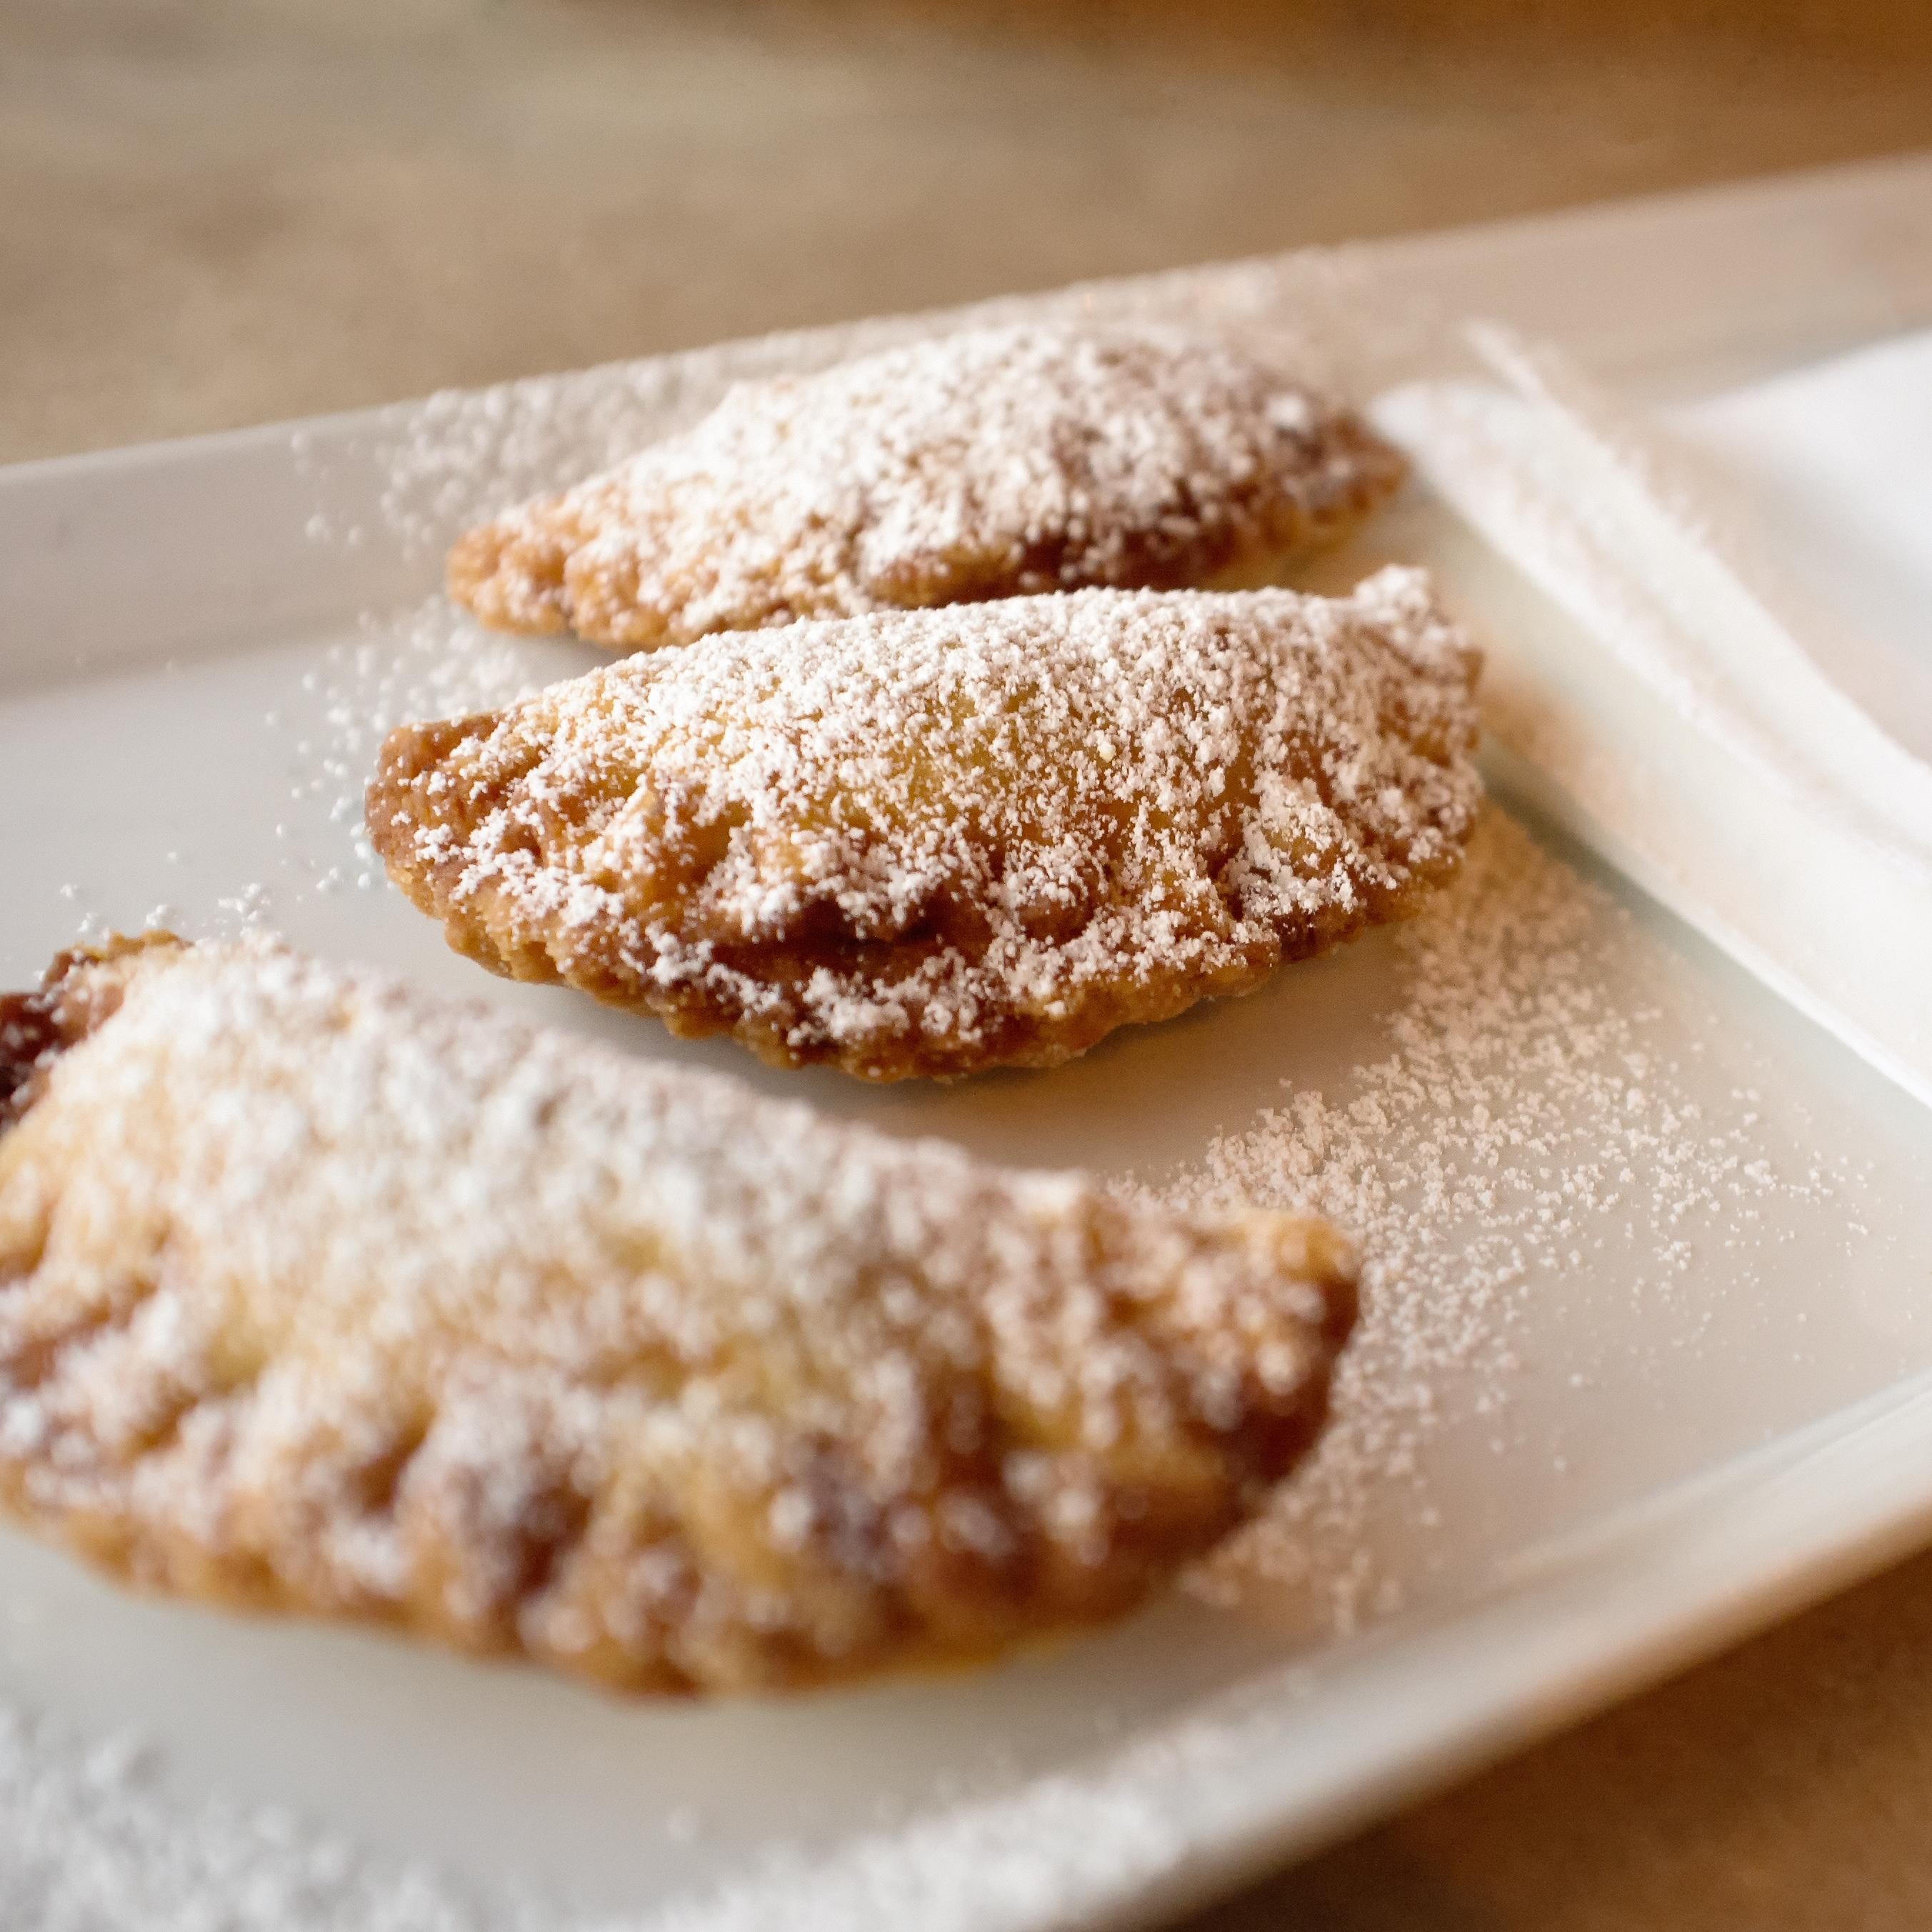 three half circle fried pies sprinkled with powdered sugar